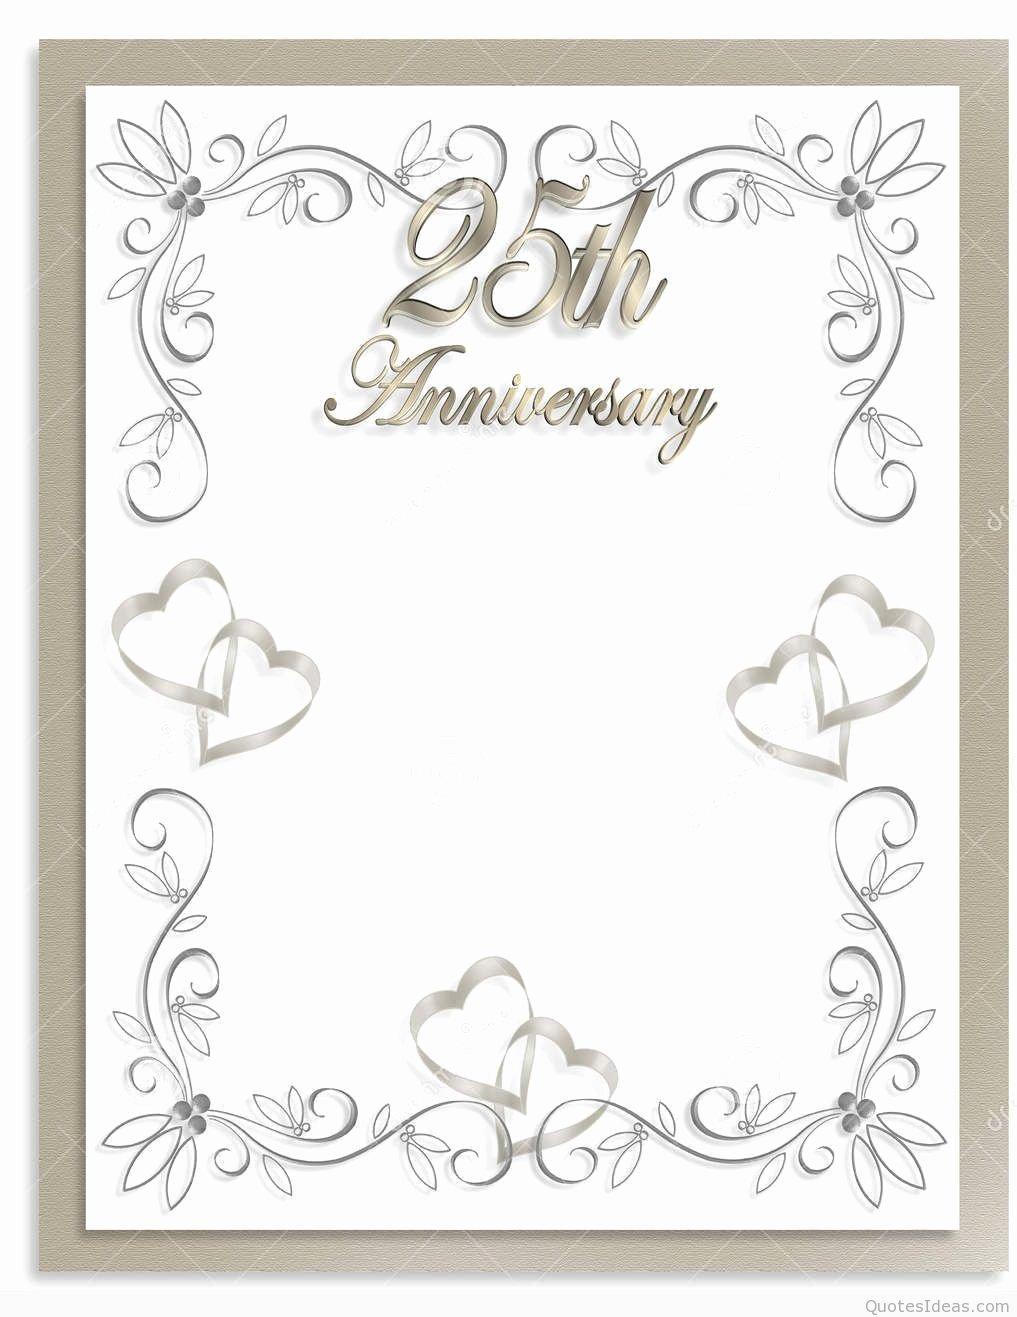 25th Wedding Anniversary Invitations Templates Unique Free 25th Wedding Anniversary Invitations Free Templates for 25th Wedding Anniversary